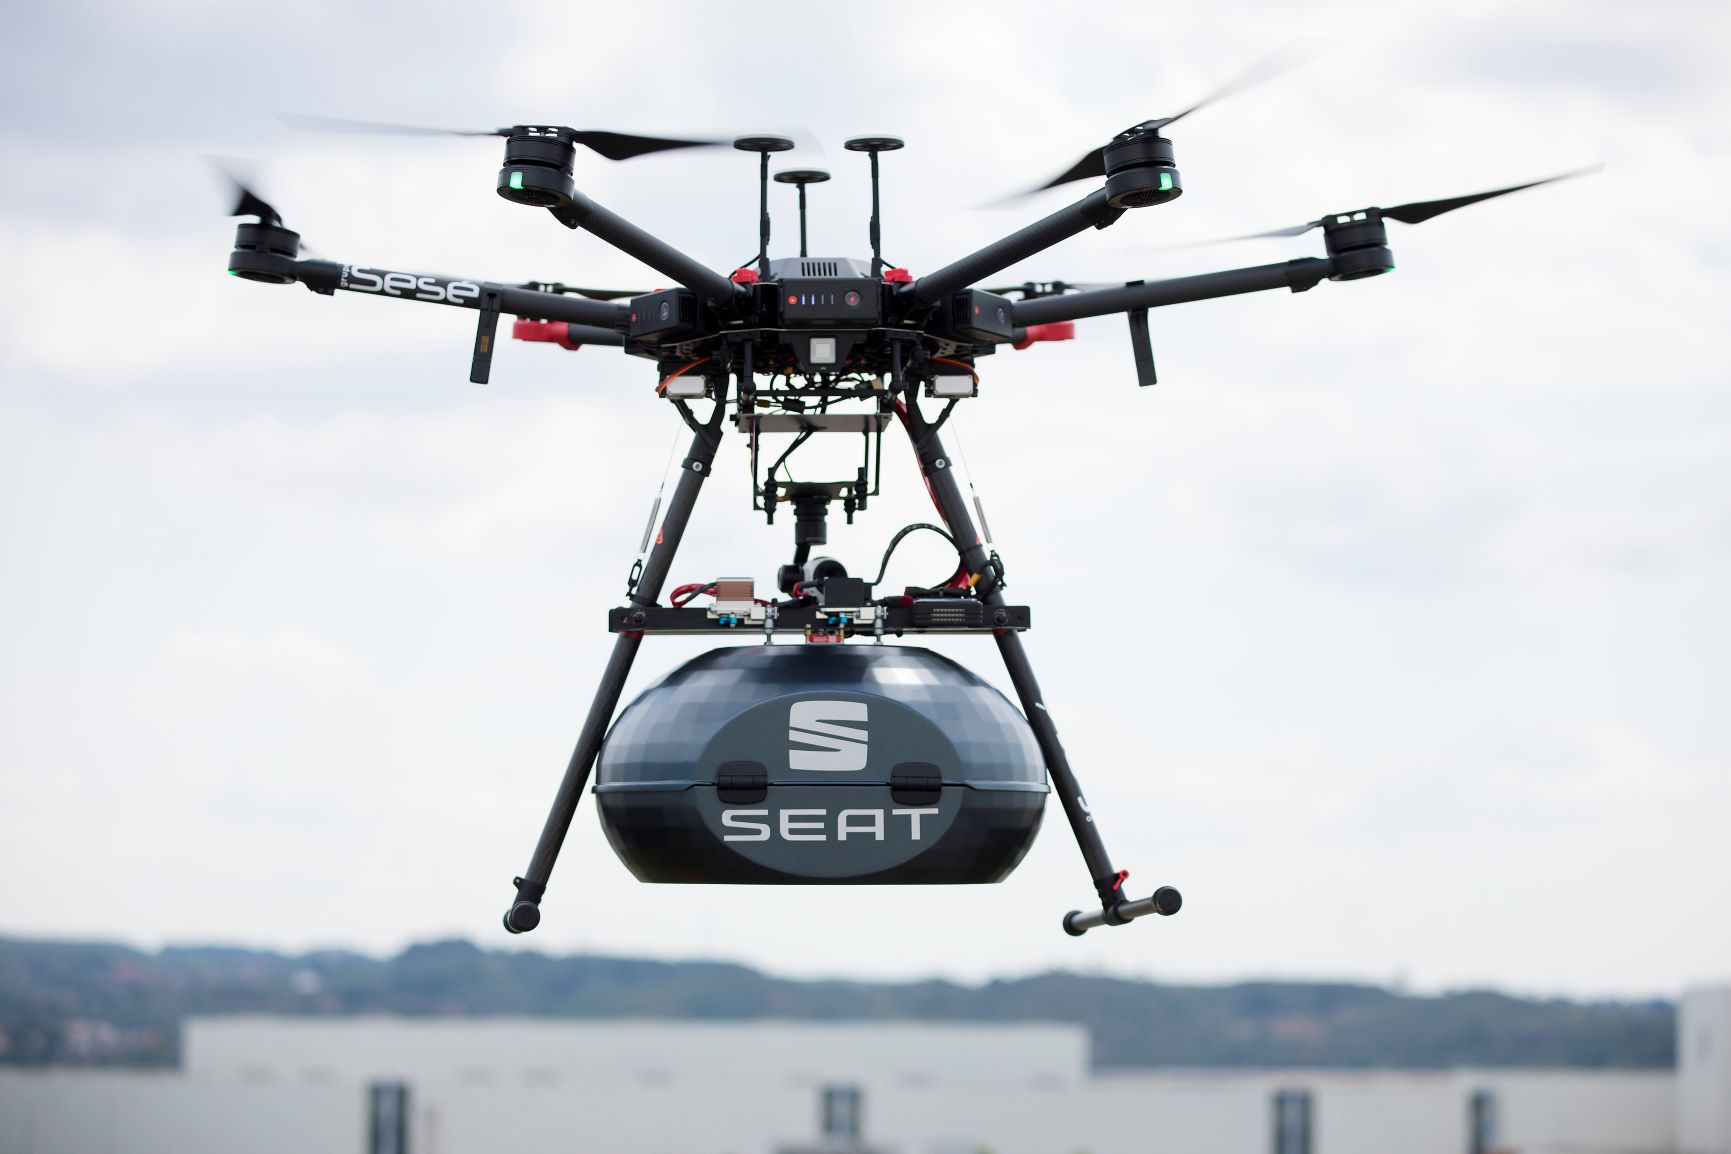 SEAT CES 2020 drone